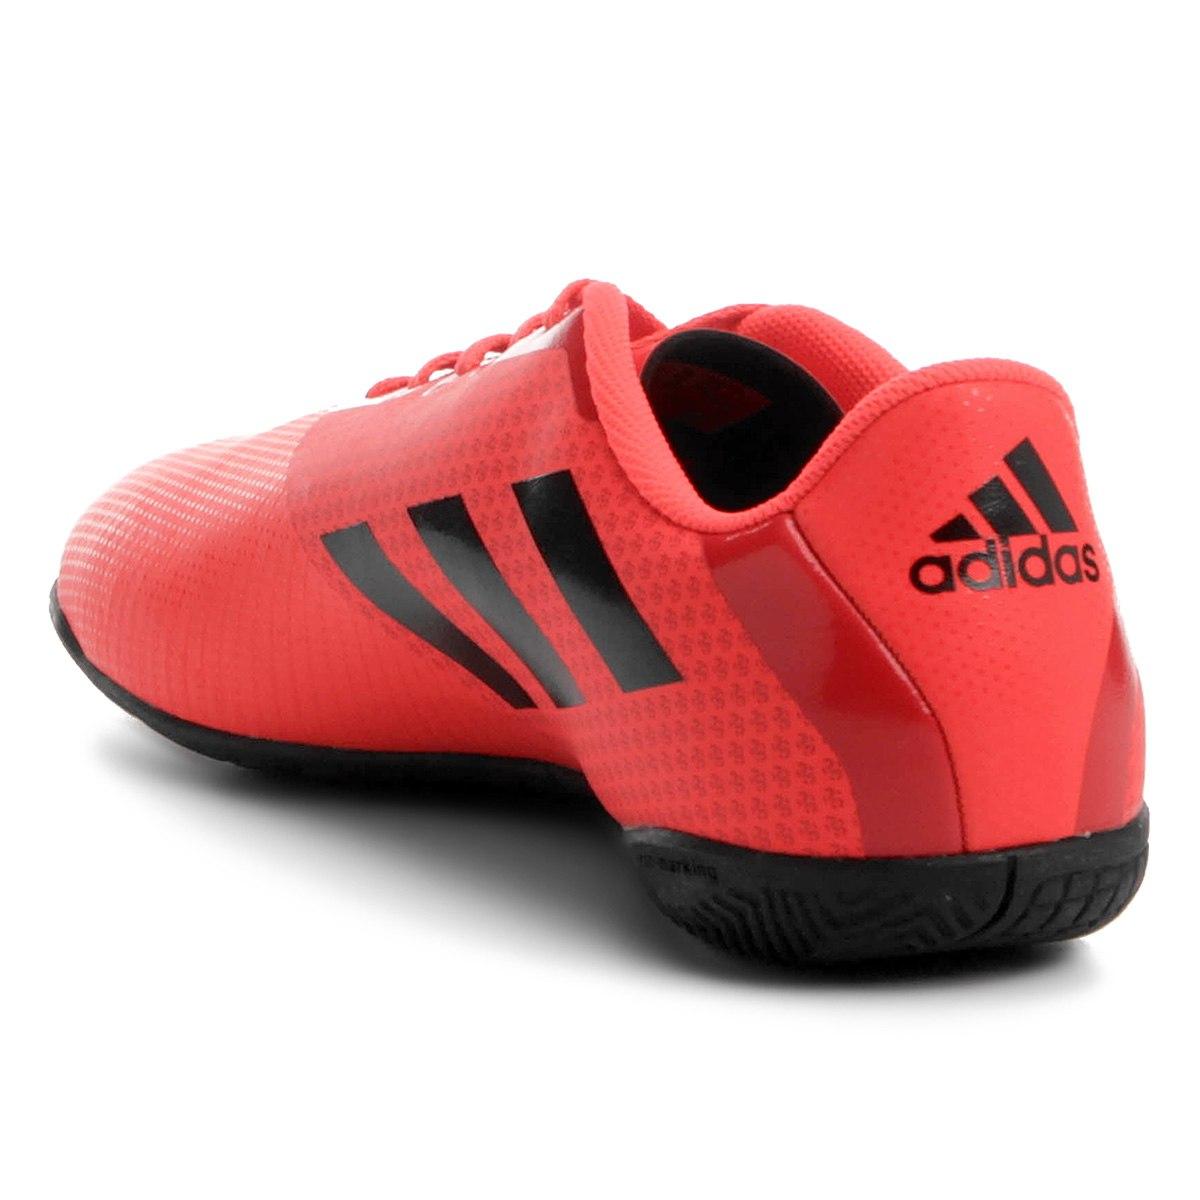 15a0e69219327 ... Chuteira Futsal Adidas Artilheira ll IN Masculino - Laranja/Preto ...